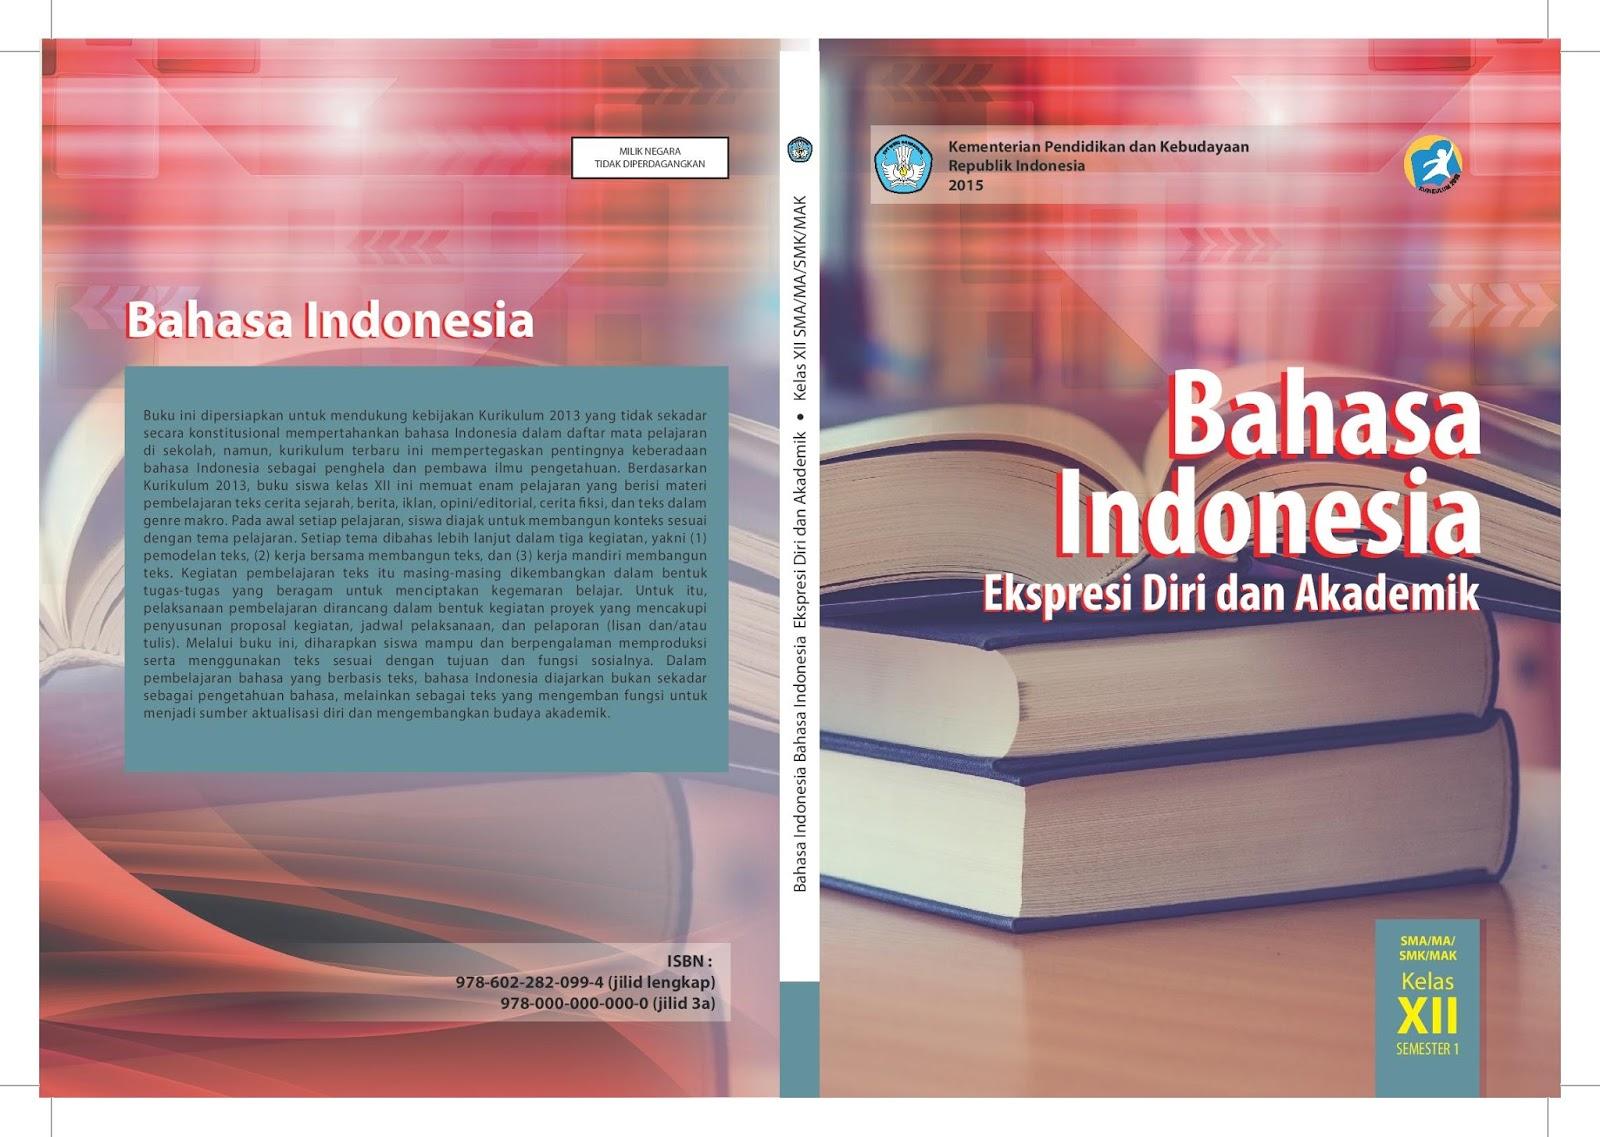 Jawaban Buku Paket Bahasa Indonesia Kelas 12 Halaman 9 22 Semester 1 Materi Kelas